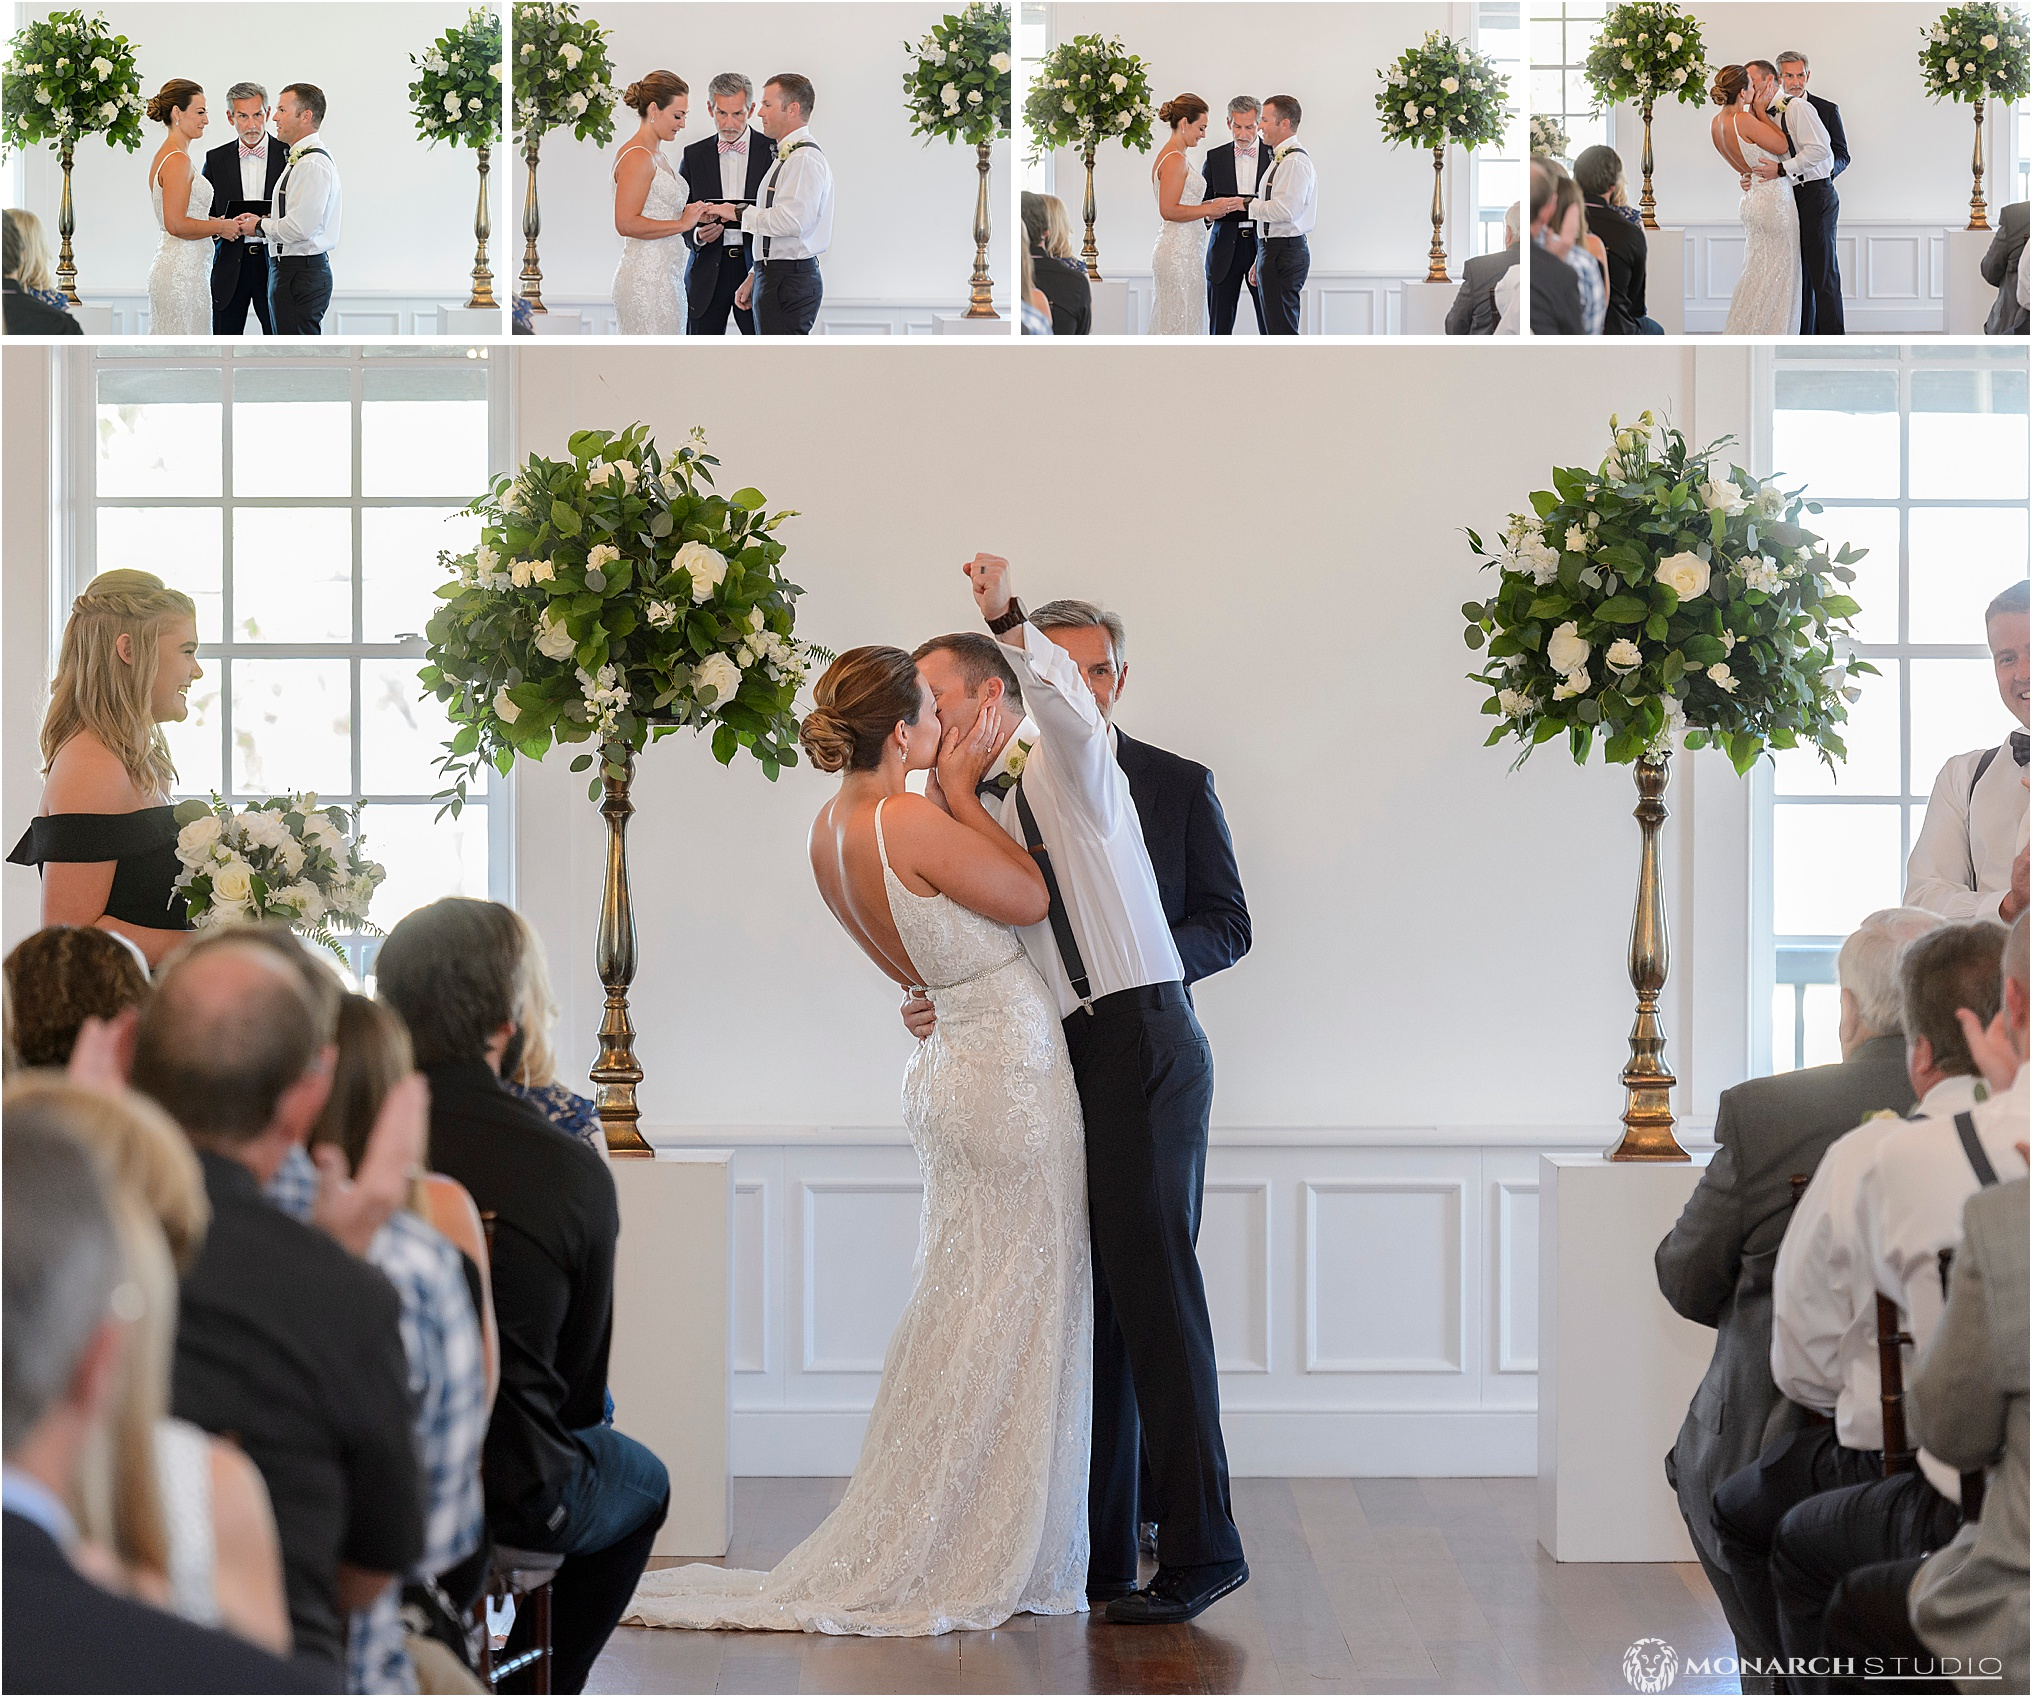 076-whiteroom-wedding-photographer-2019-05-22_0058.jpg